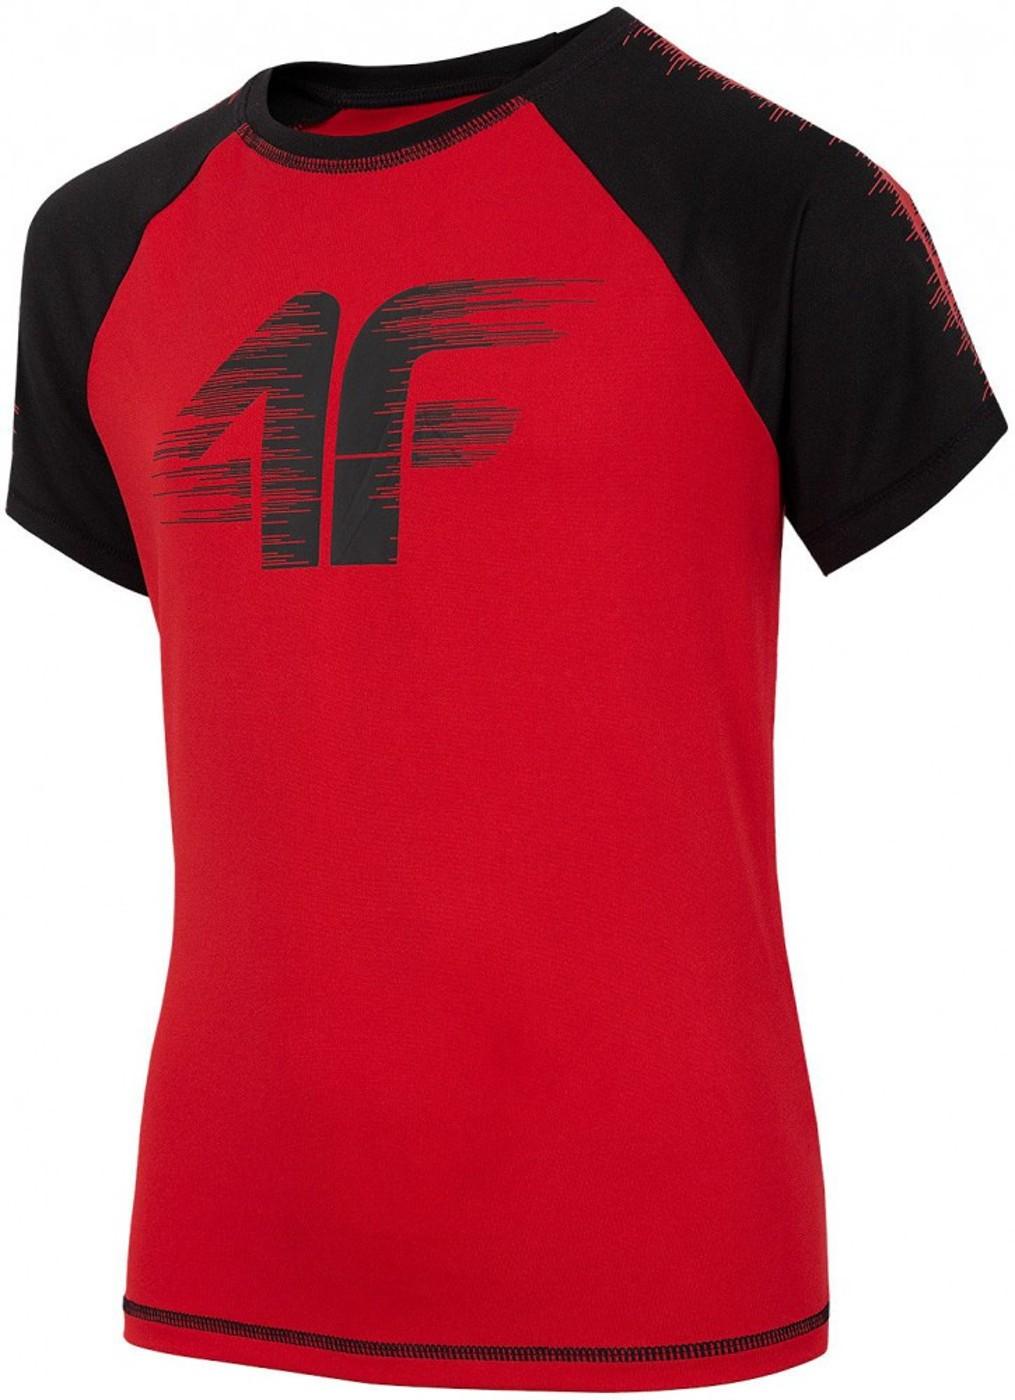 4F Boys T-Shirt Logo - Kinder